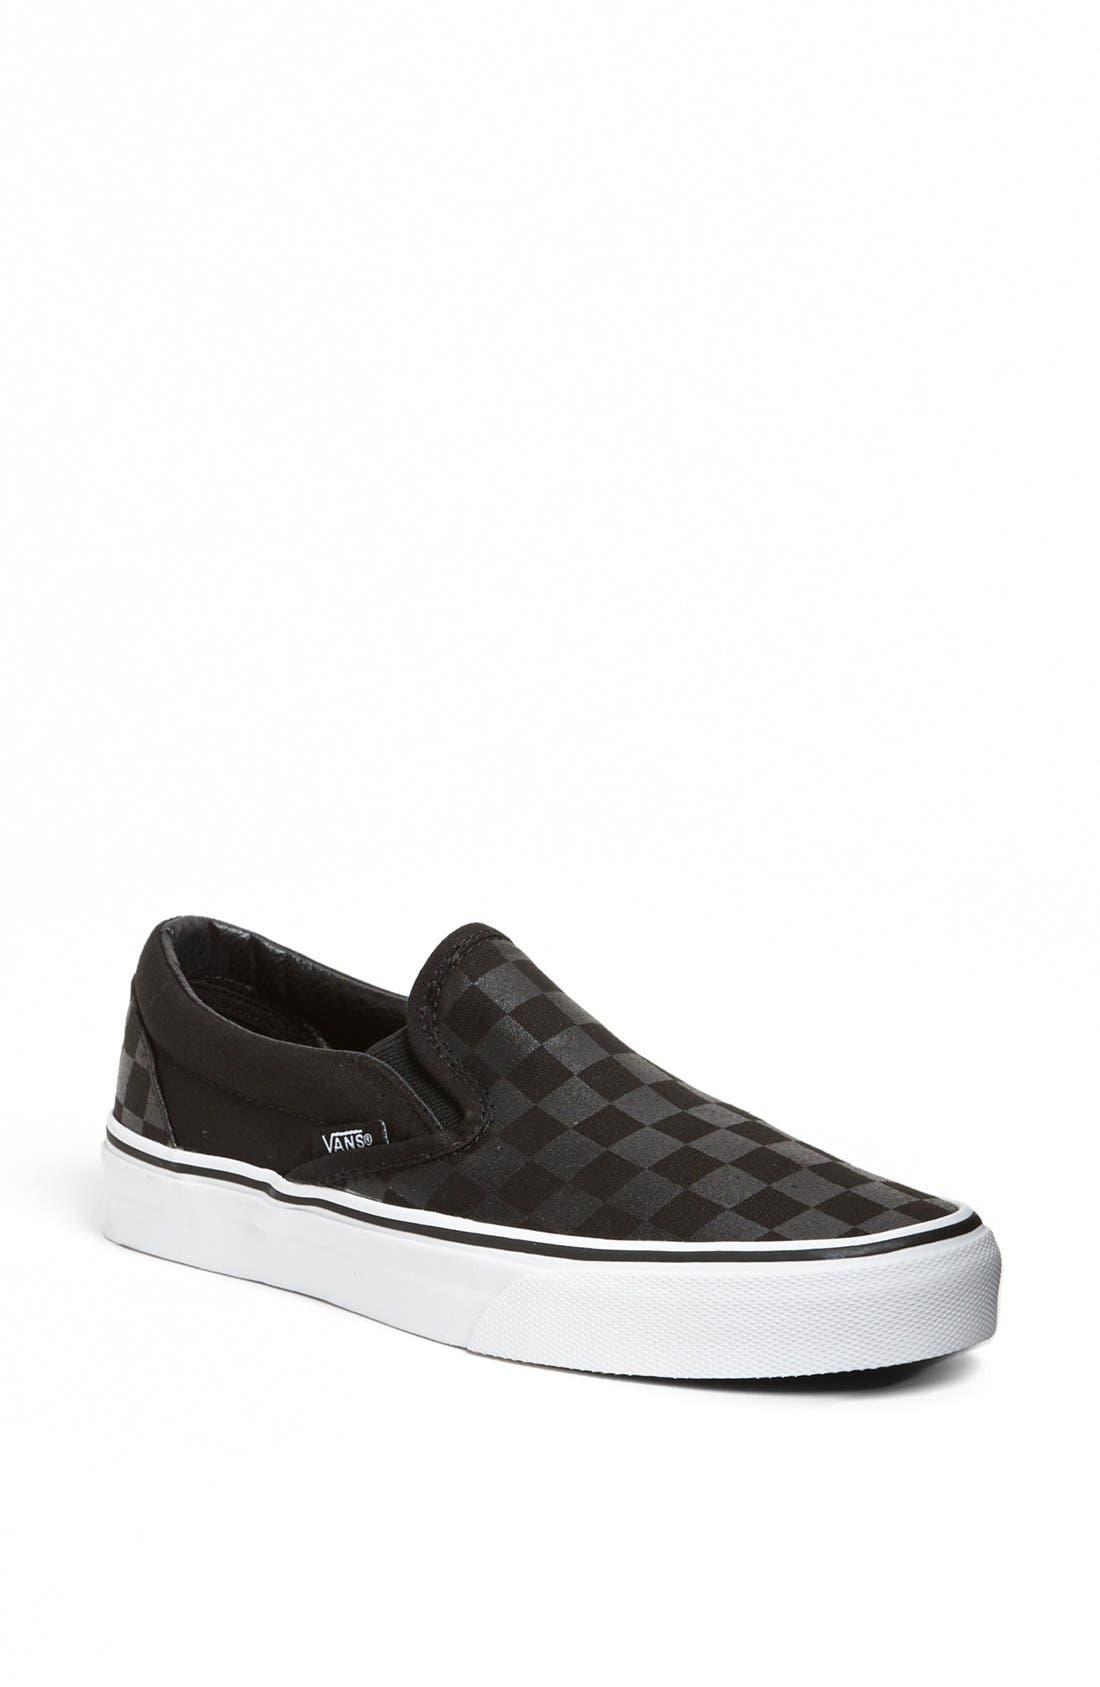 Main Image - Vans 'Classic' Sneaker (Women)